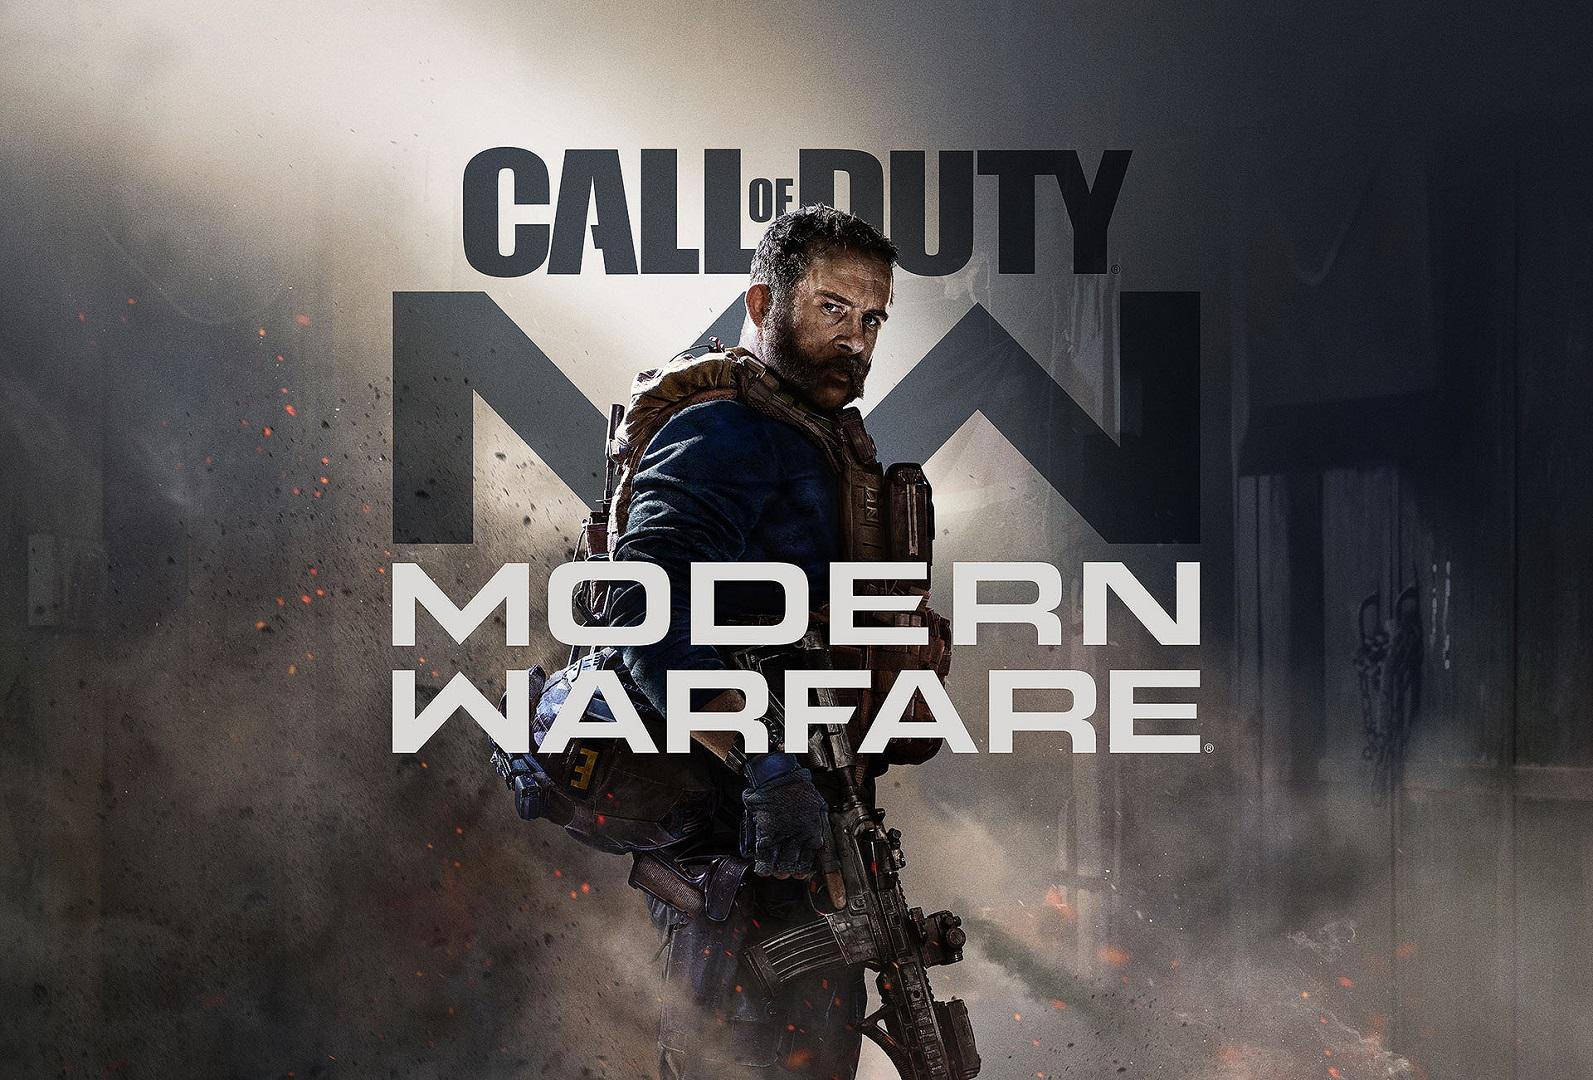 Nvidia демонстрирует мощь Ti 2080 в новом Call of Duty: Modern Warfare